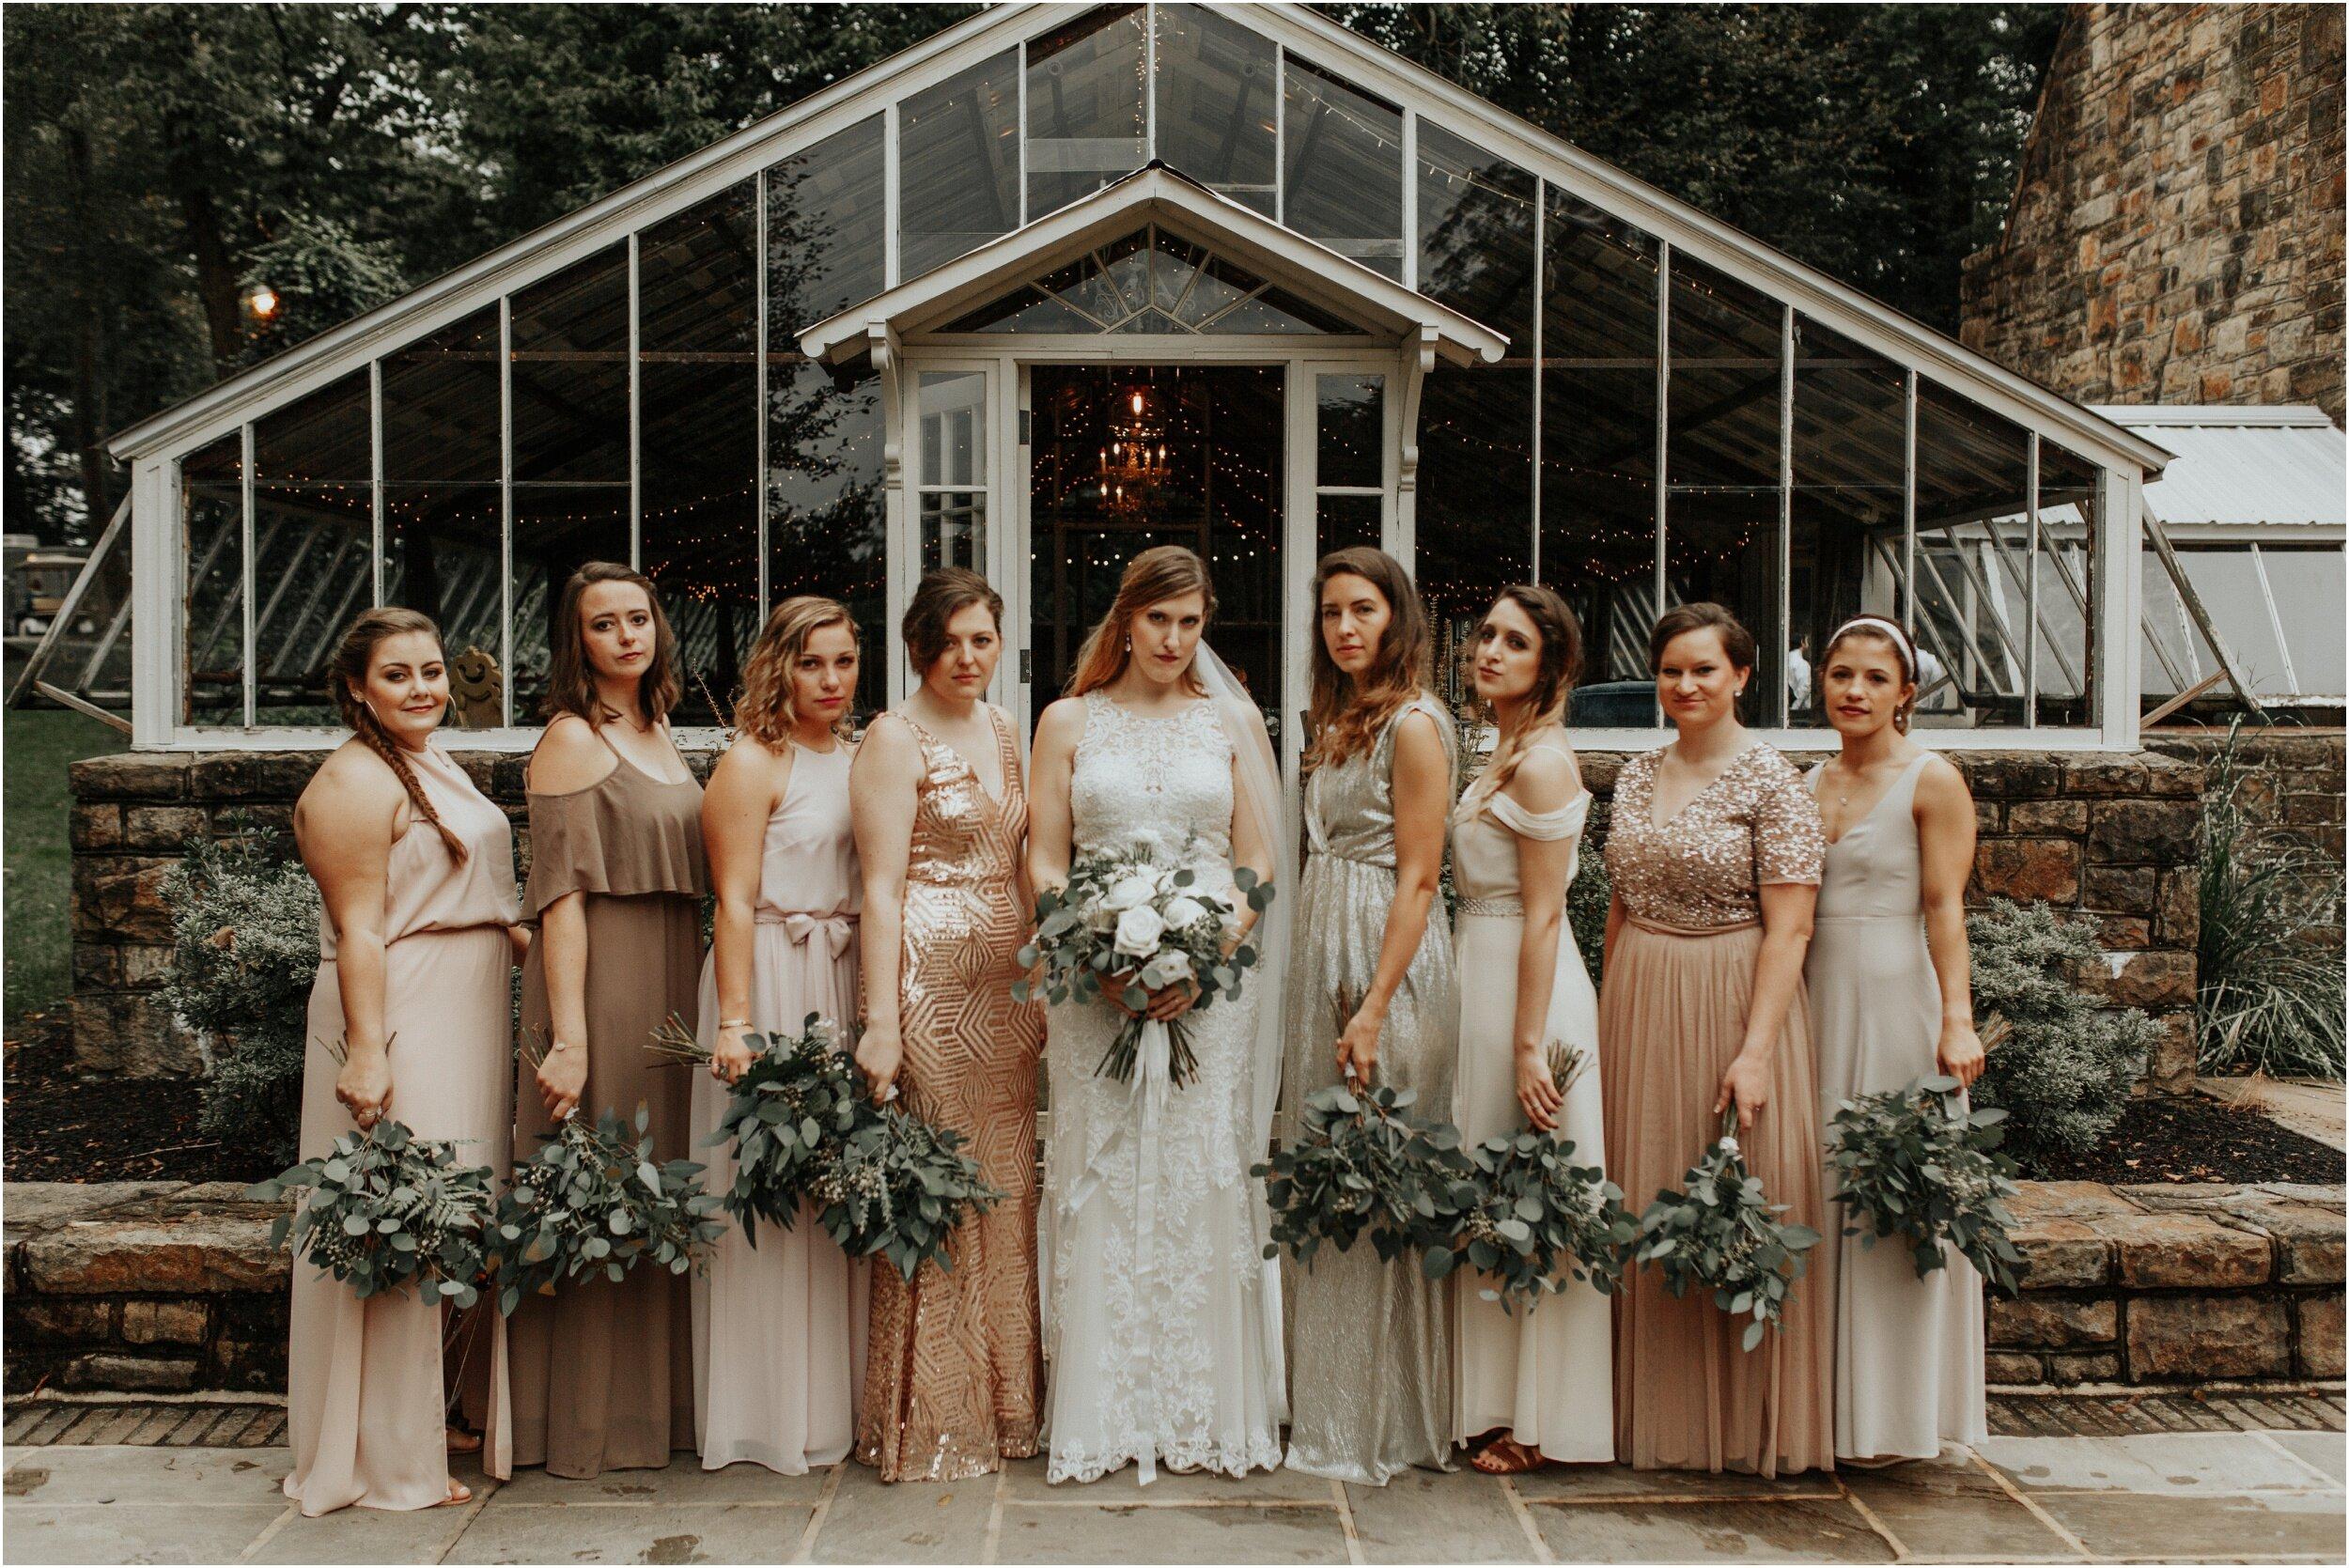 steph-and-jordan-cox-our-wedding-historic-shady-lane-compass-wedding-collective-hazel-lining-photography-destination-elopement-wedding-engagement-photography_0045.jpg